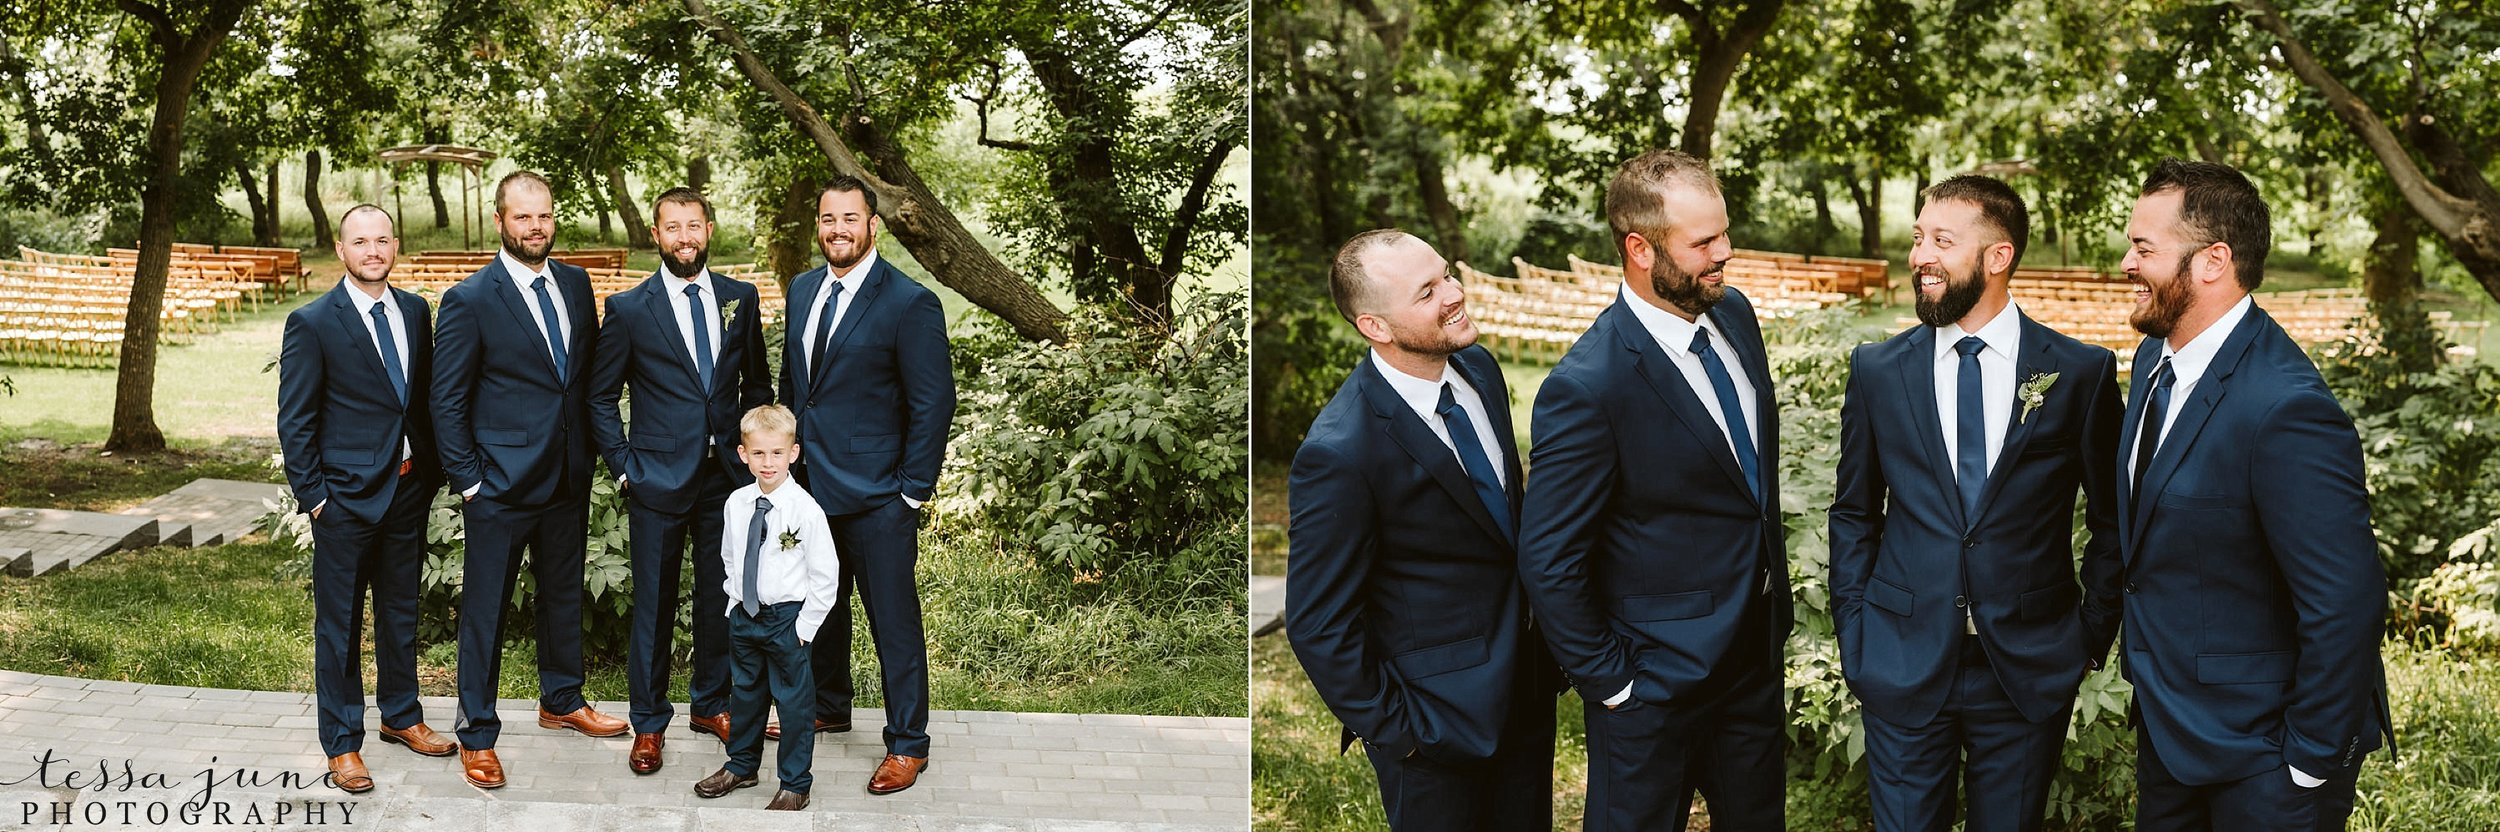 gathered-oaks-barn-wedding-alexandria-minnesota-15.jpg